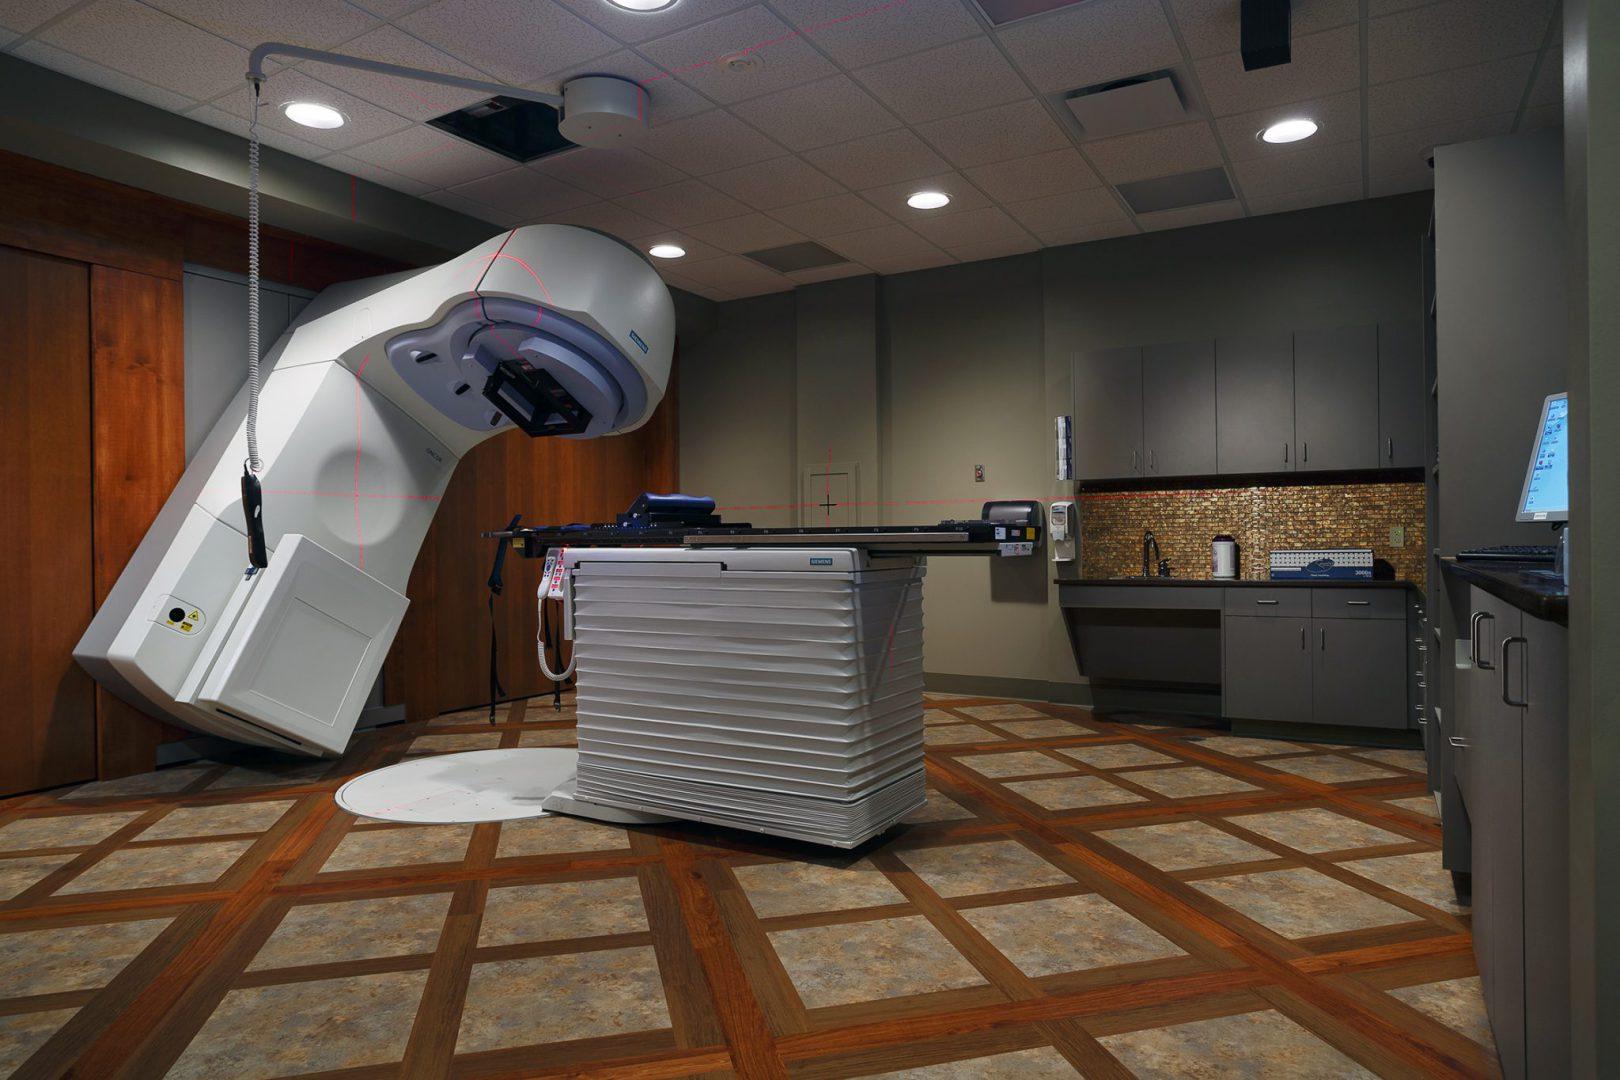 Spartanburg Regional Healthcare, Gibbs Cancer Center at Gaffney